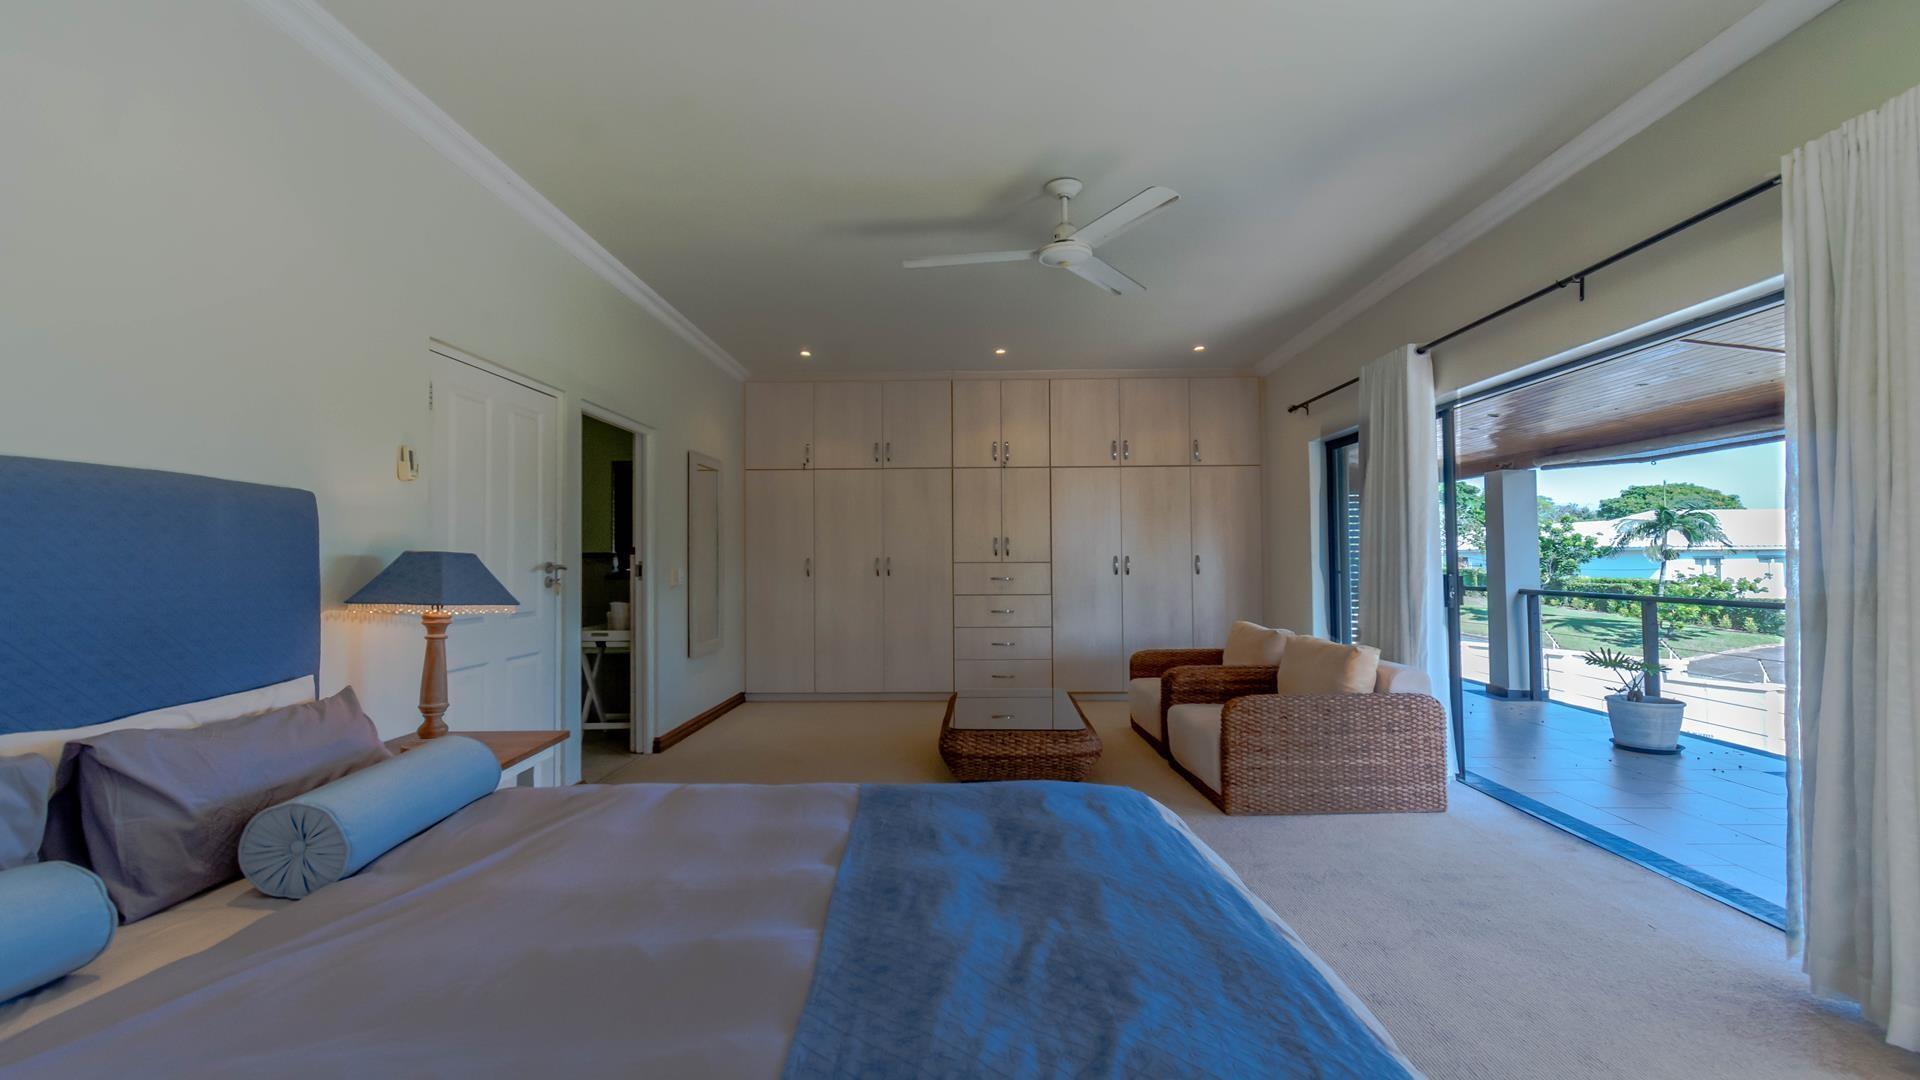 3 Bedroom Townhouse For Sale in Zinkwazi Beach